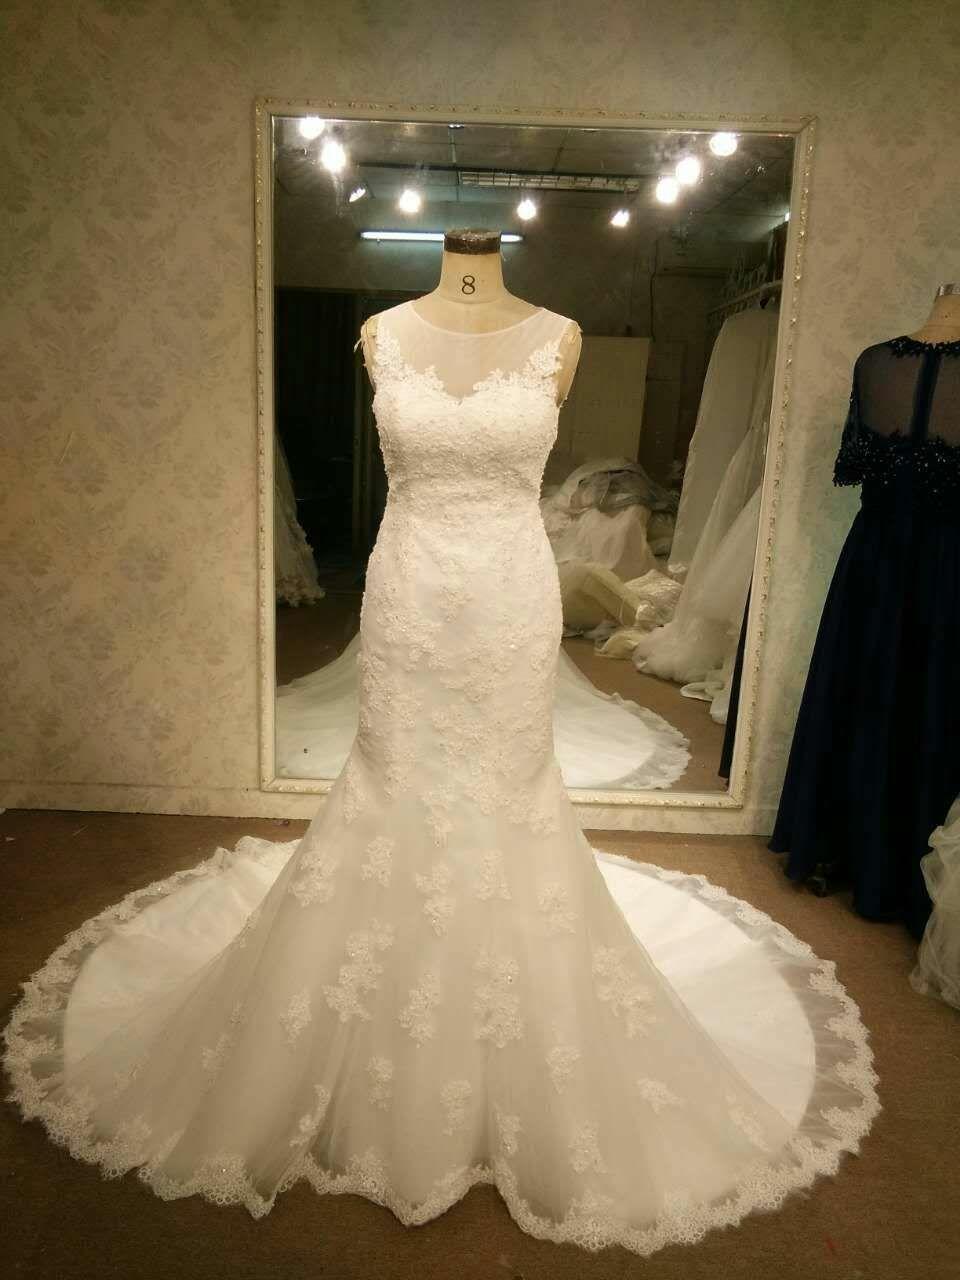 Illusion neckline bridal dresses with no sleeves by darius